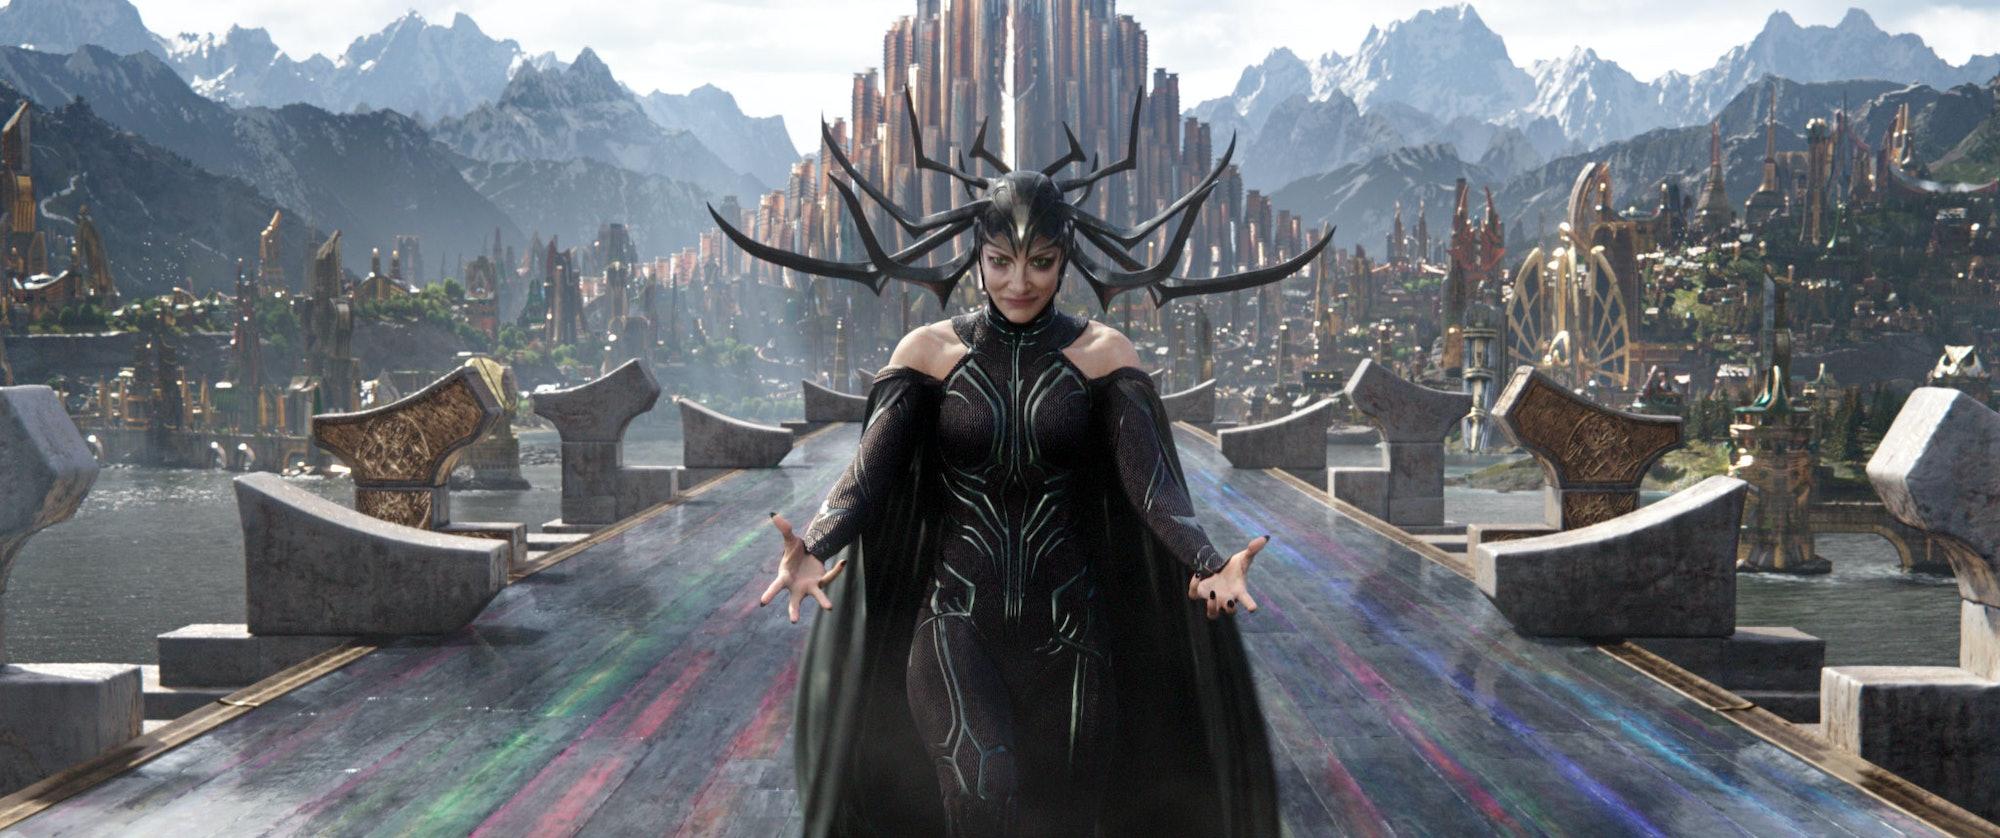 Thor Ragnarok Cate Blanchett